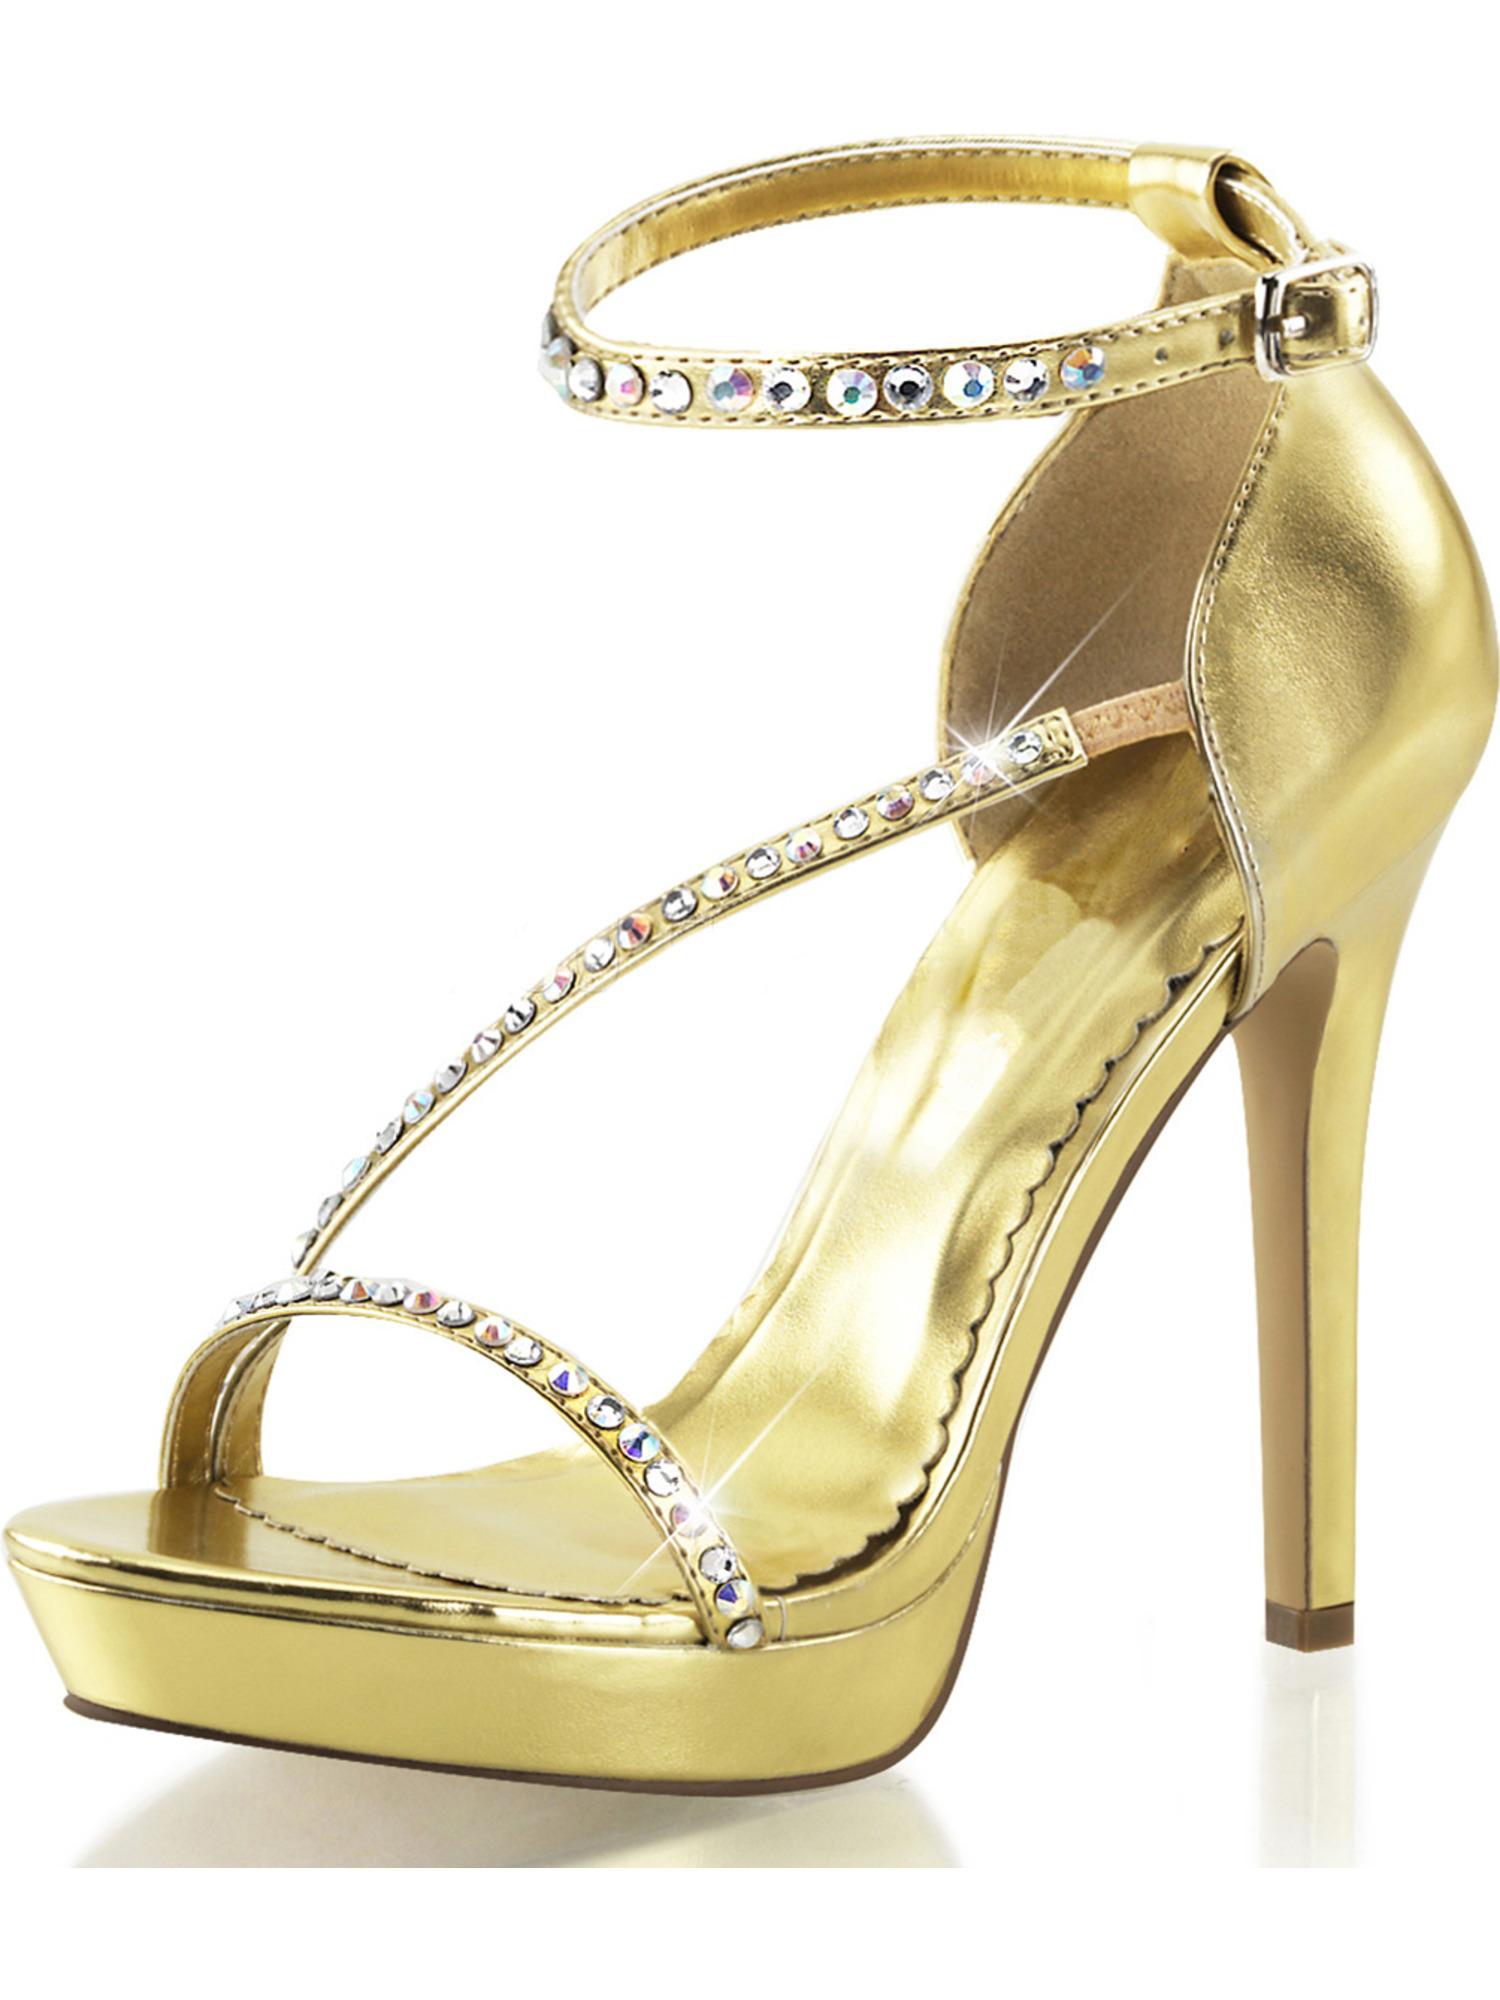 womens gold sparkly heels platform sandals rhinestone shoes 4 3/4 inch heels